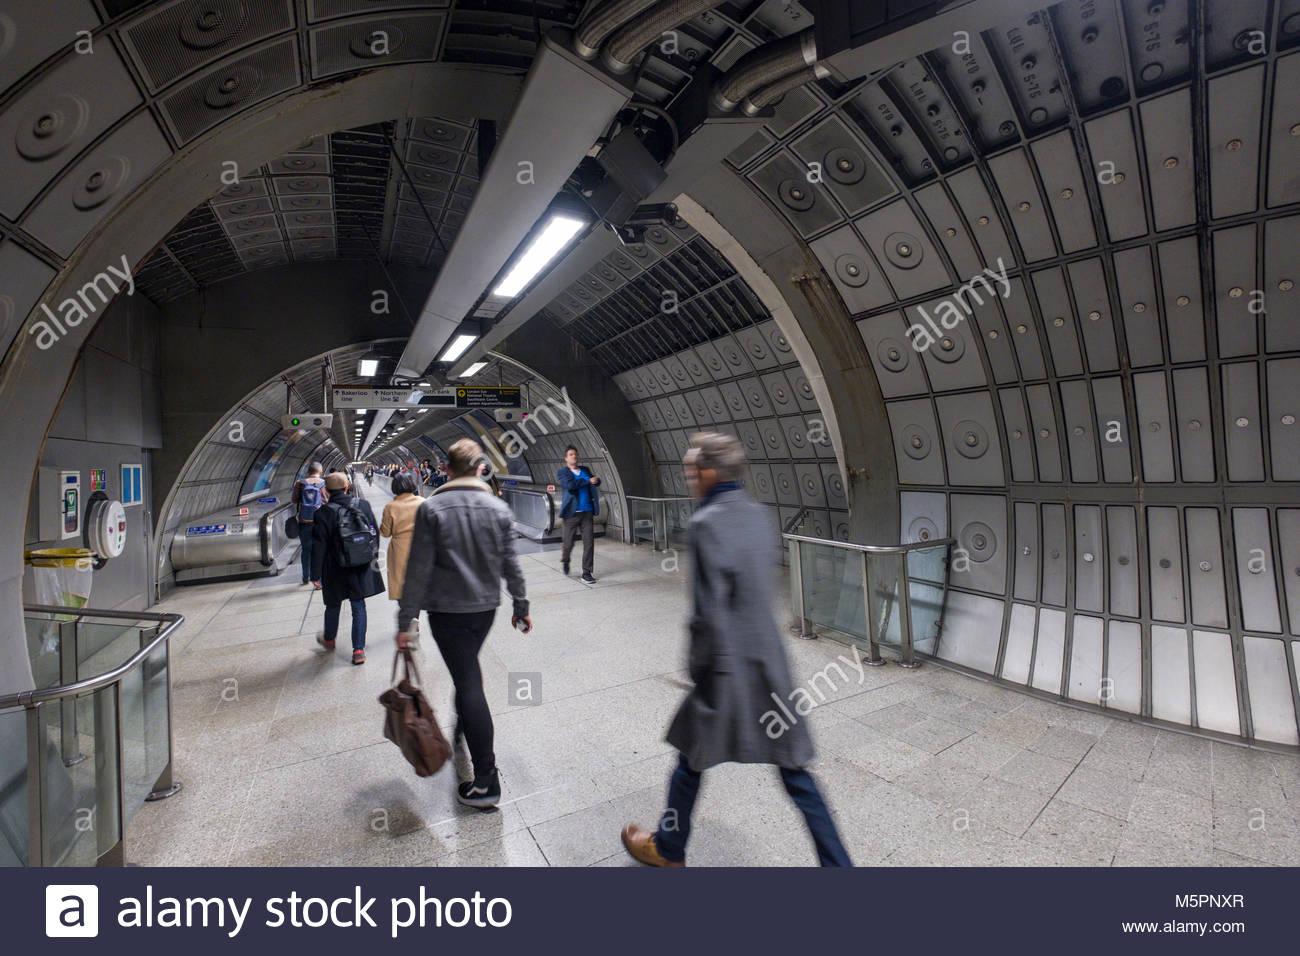 People walking in tunnel, Waterloo underground station, Lambeth, London, England, United Kingdom - Stock Image